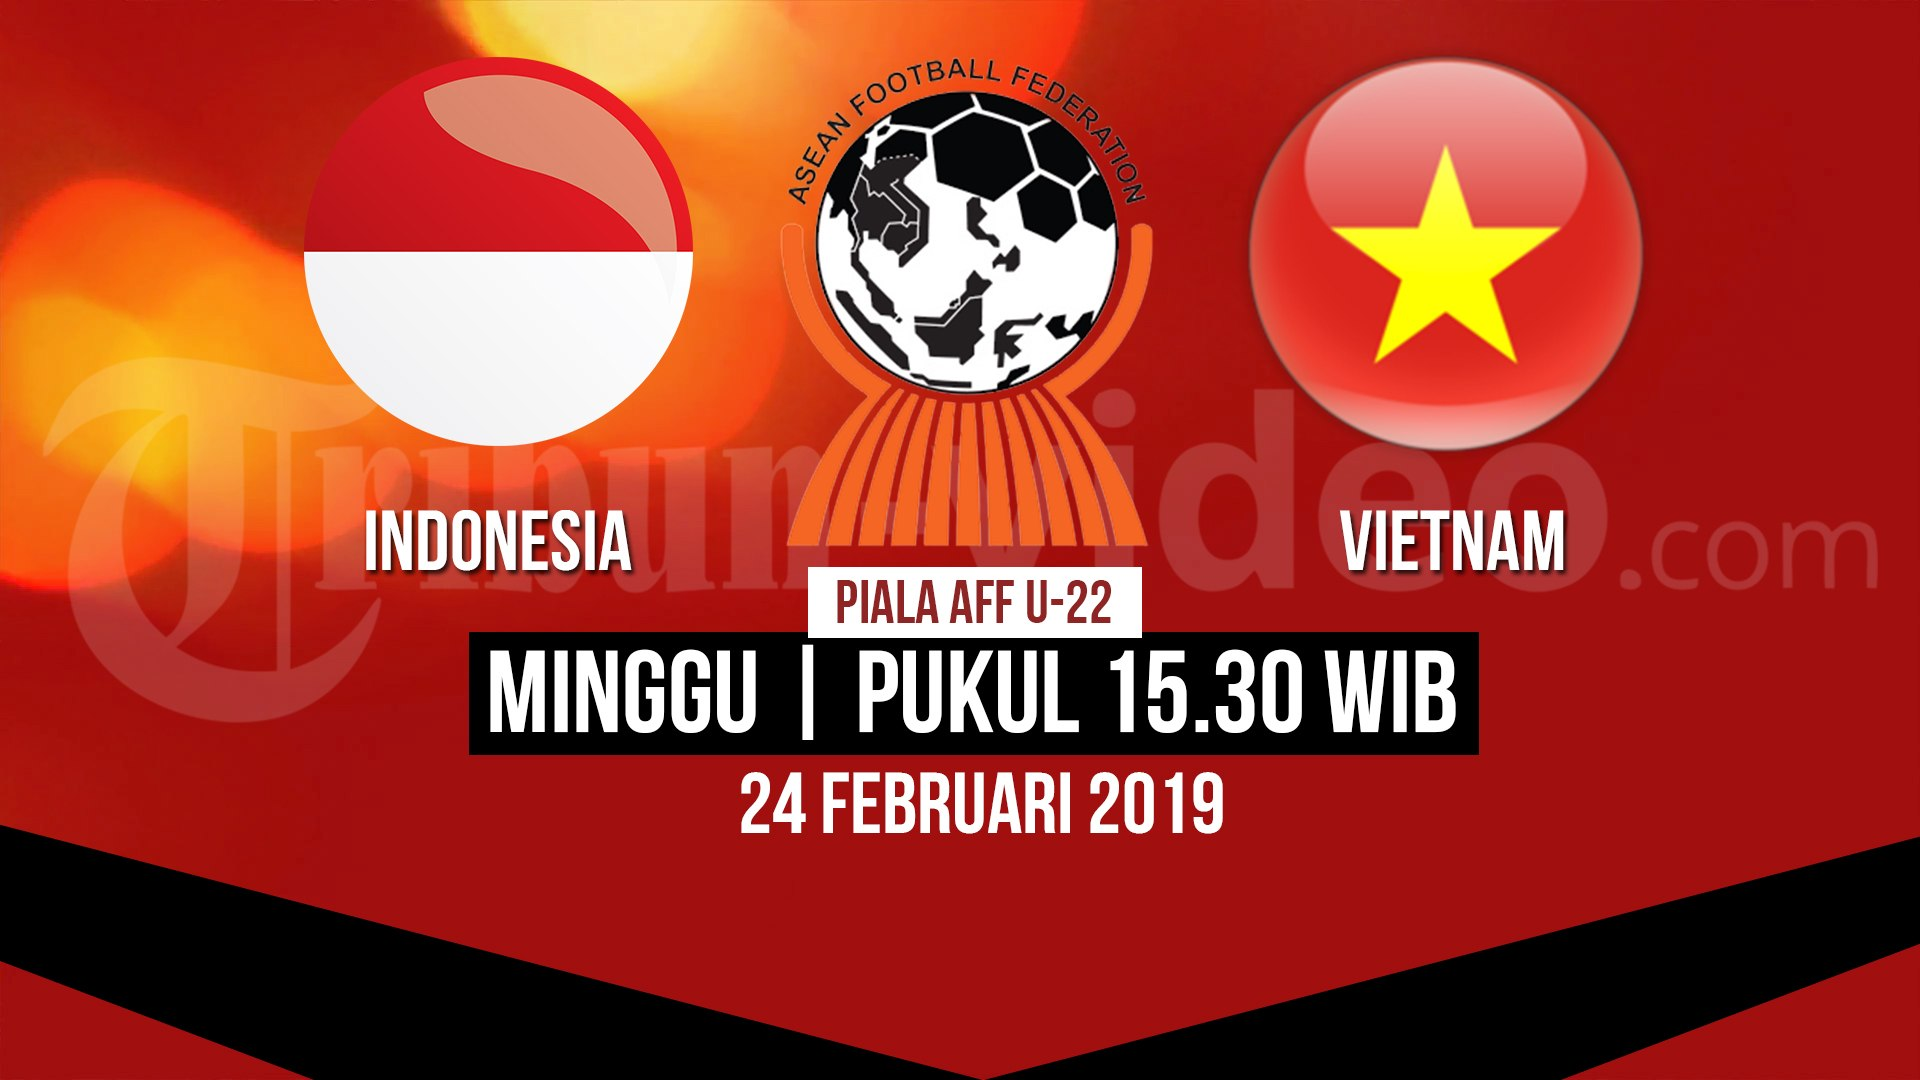 Jadwal Piala AFF U-22, Indonesia Vs Vietnam Pukul 15.30 WIB